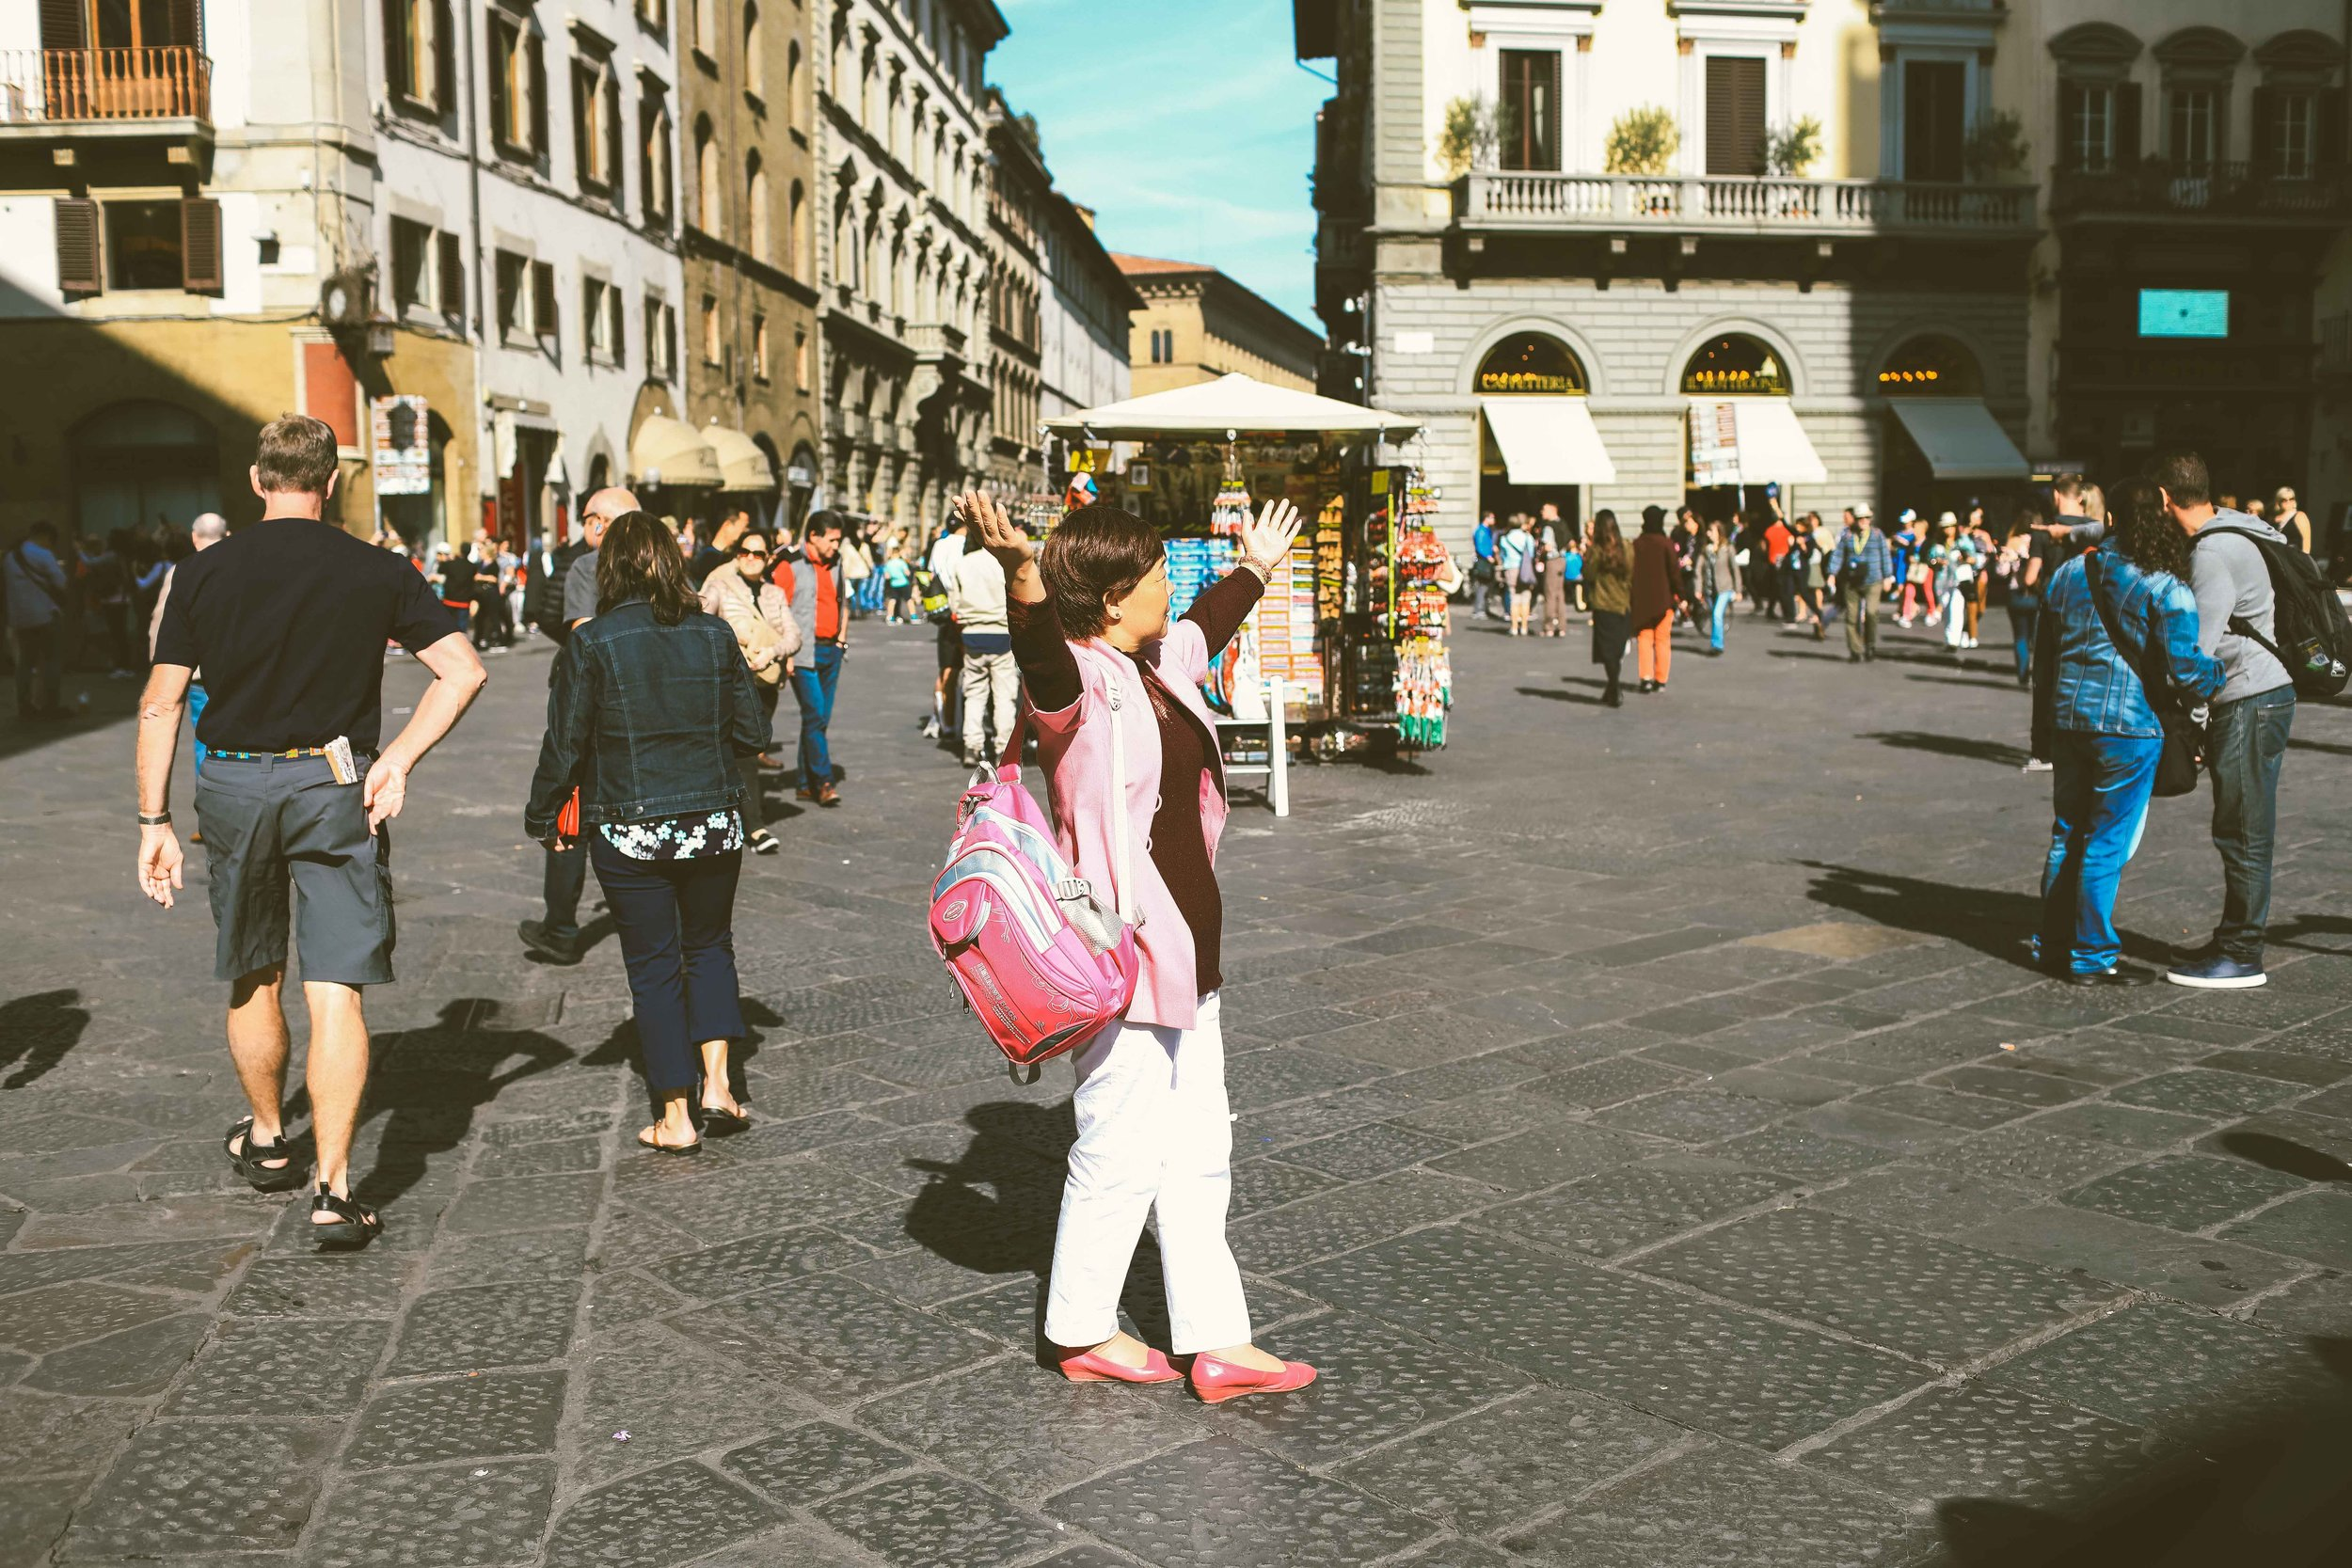 Street_Photographer_Florence_Italy.jpg